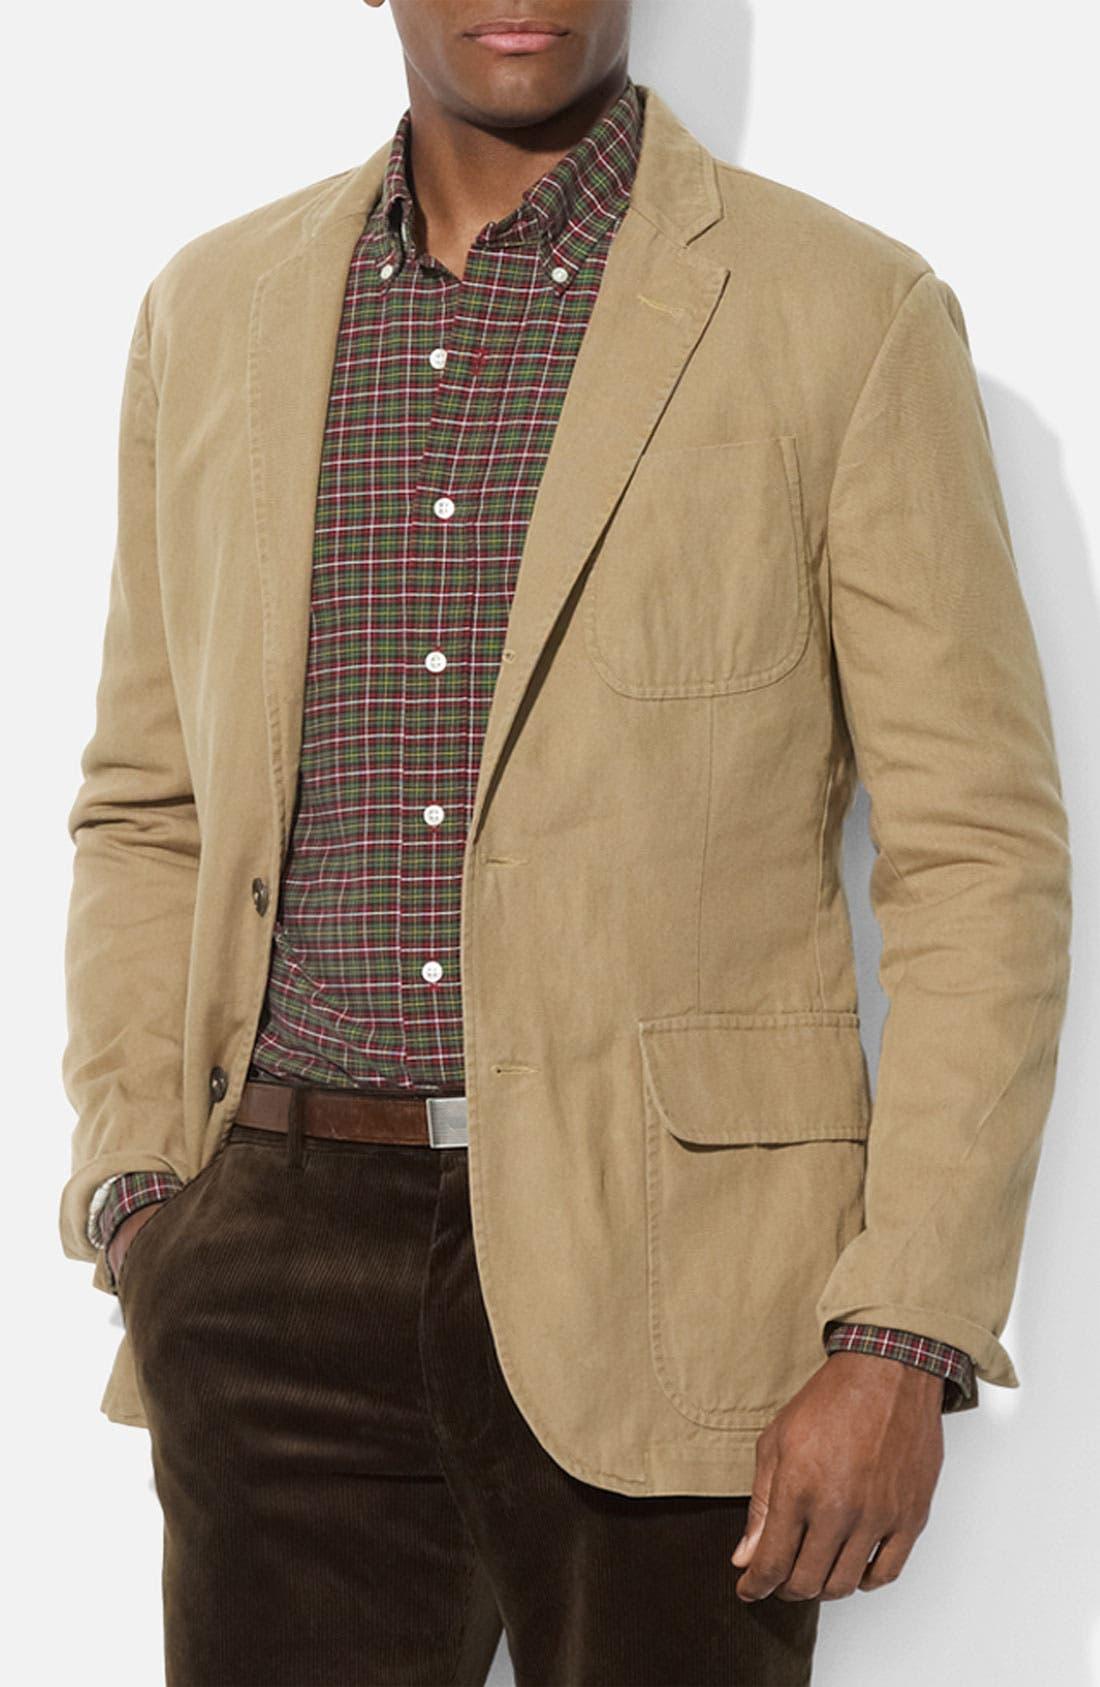 Alternate Image 1 Selected - Polo Ralph Lauren Cotton & Linen Sportcoat